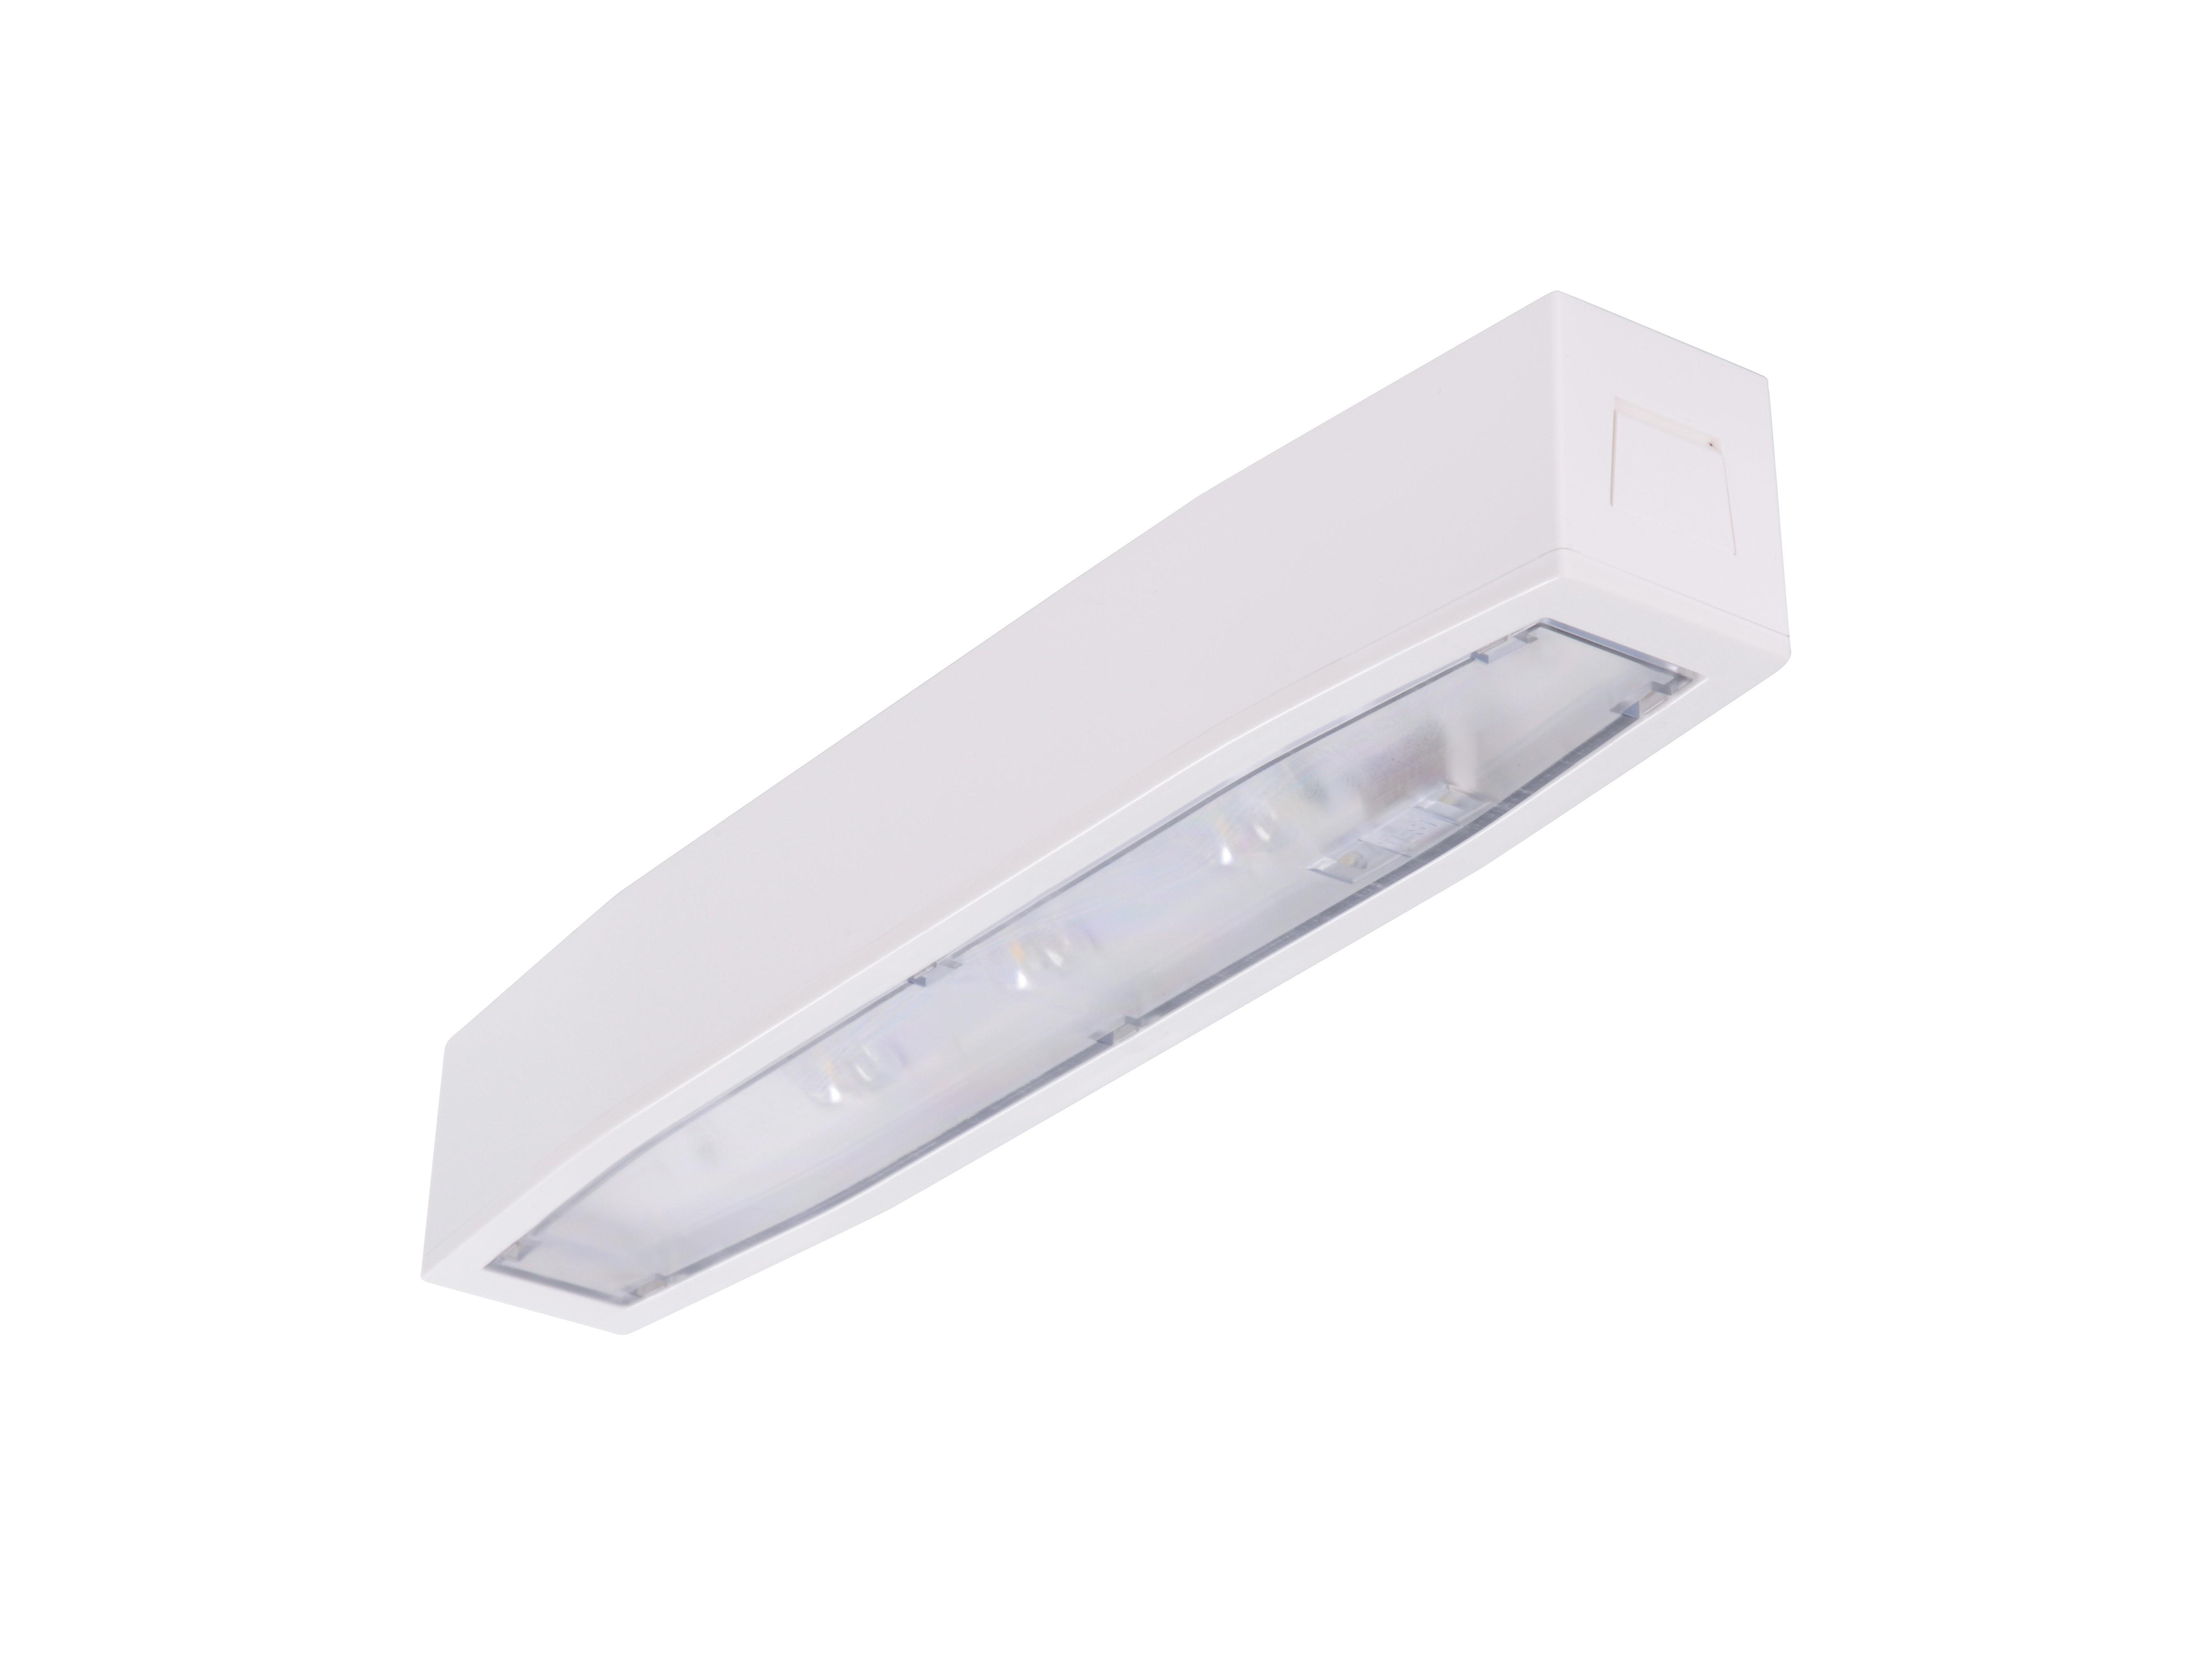 Lampa emergenta led Intelight 94523   3h nementinut test automat 0